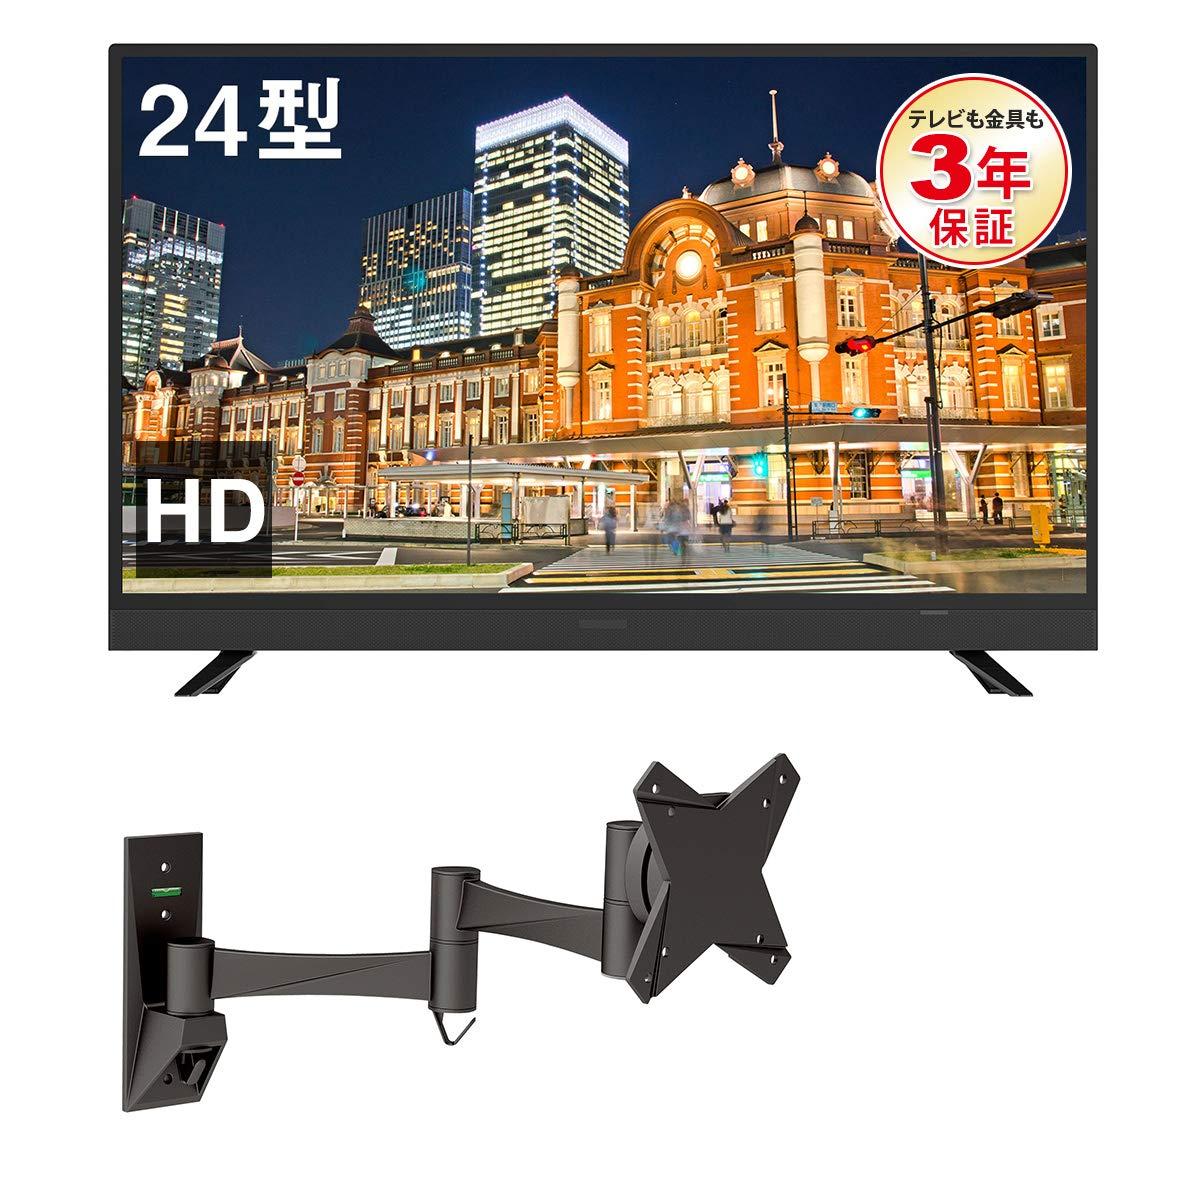 maxzen 24V型 ハイビジョン液晶テレビ+壁掛け金具セット コーナー設置可 3関節アーム金具 [maxzen J24SK03+STARPLATINUM TVセッターフリースタイルNA112 SSサイズ ブラック]  ブラック B07G58CKM2